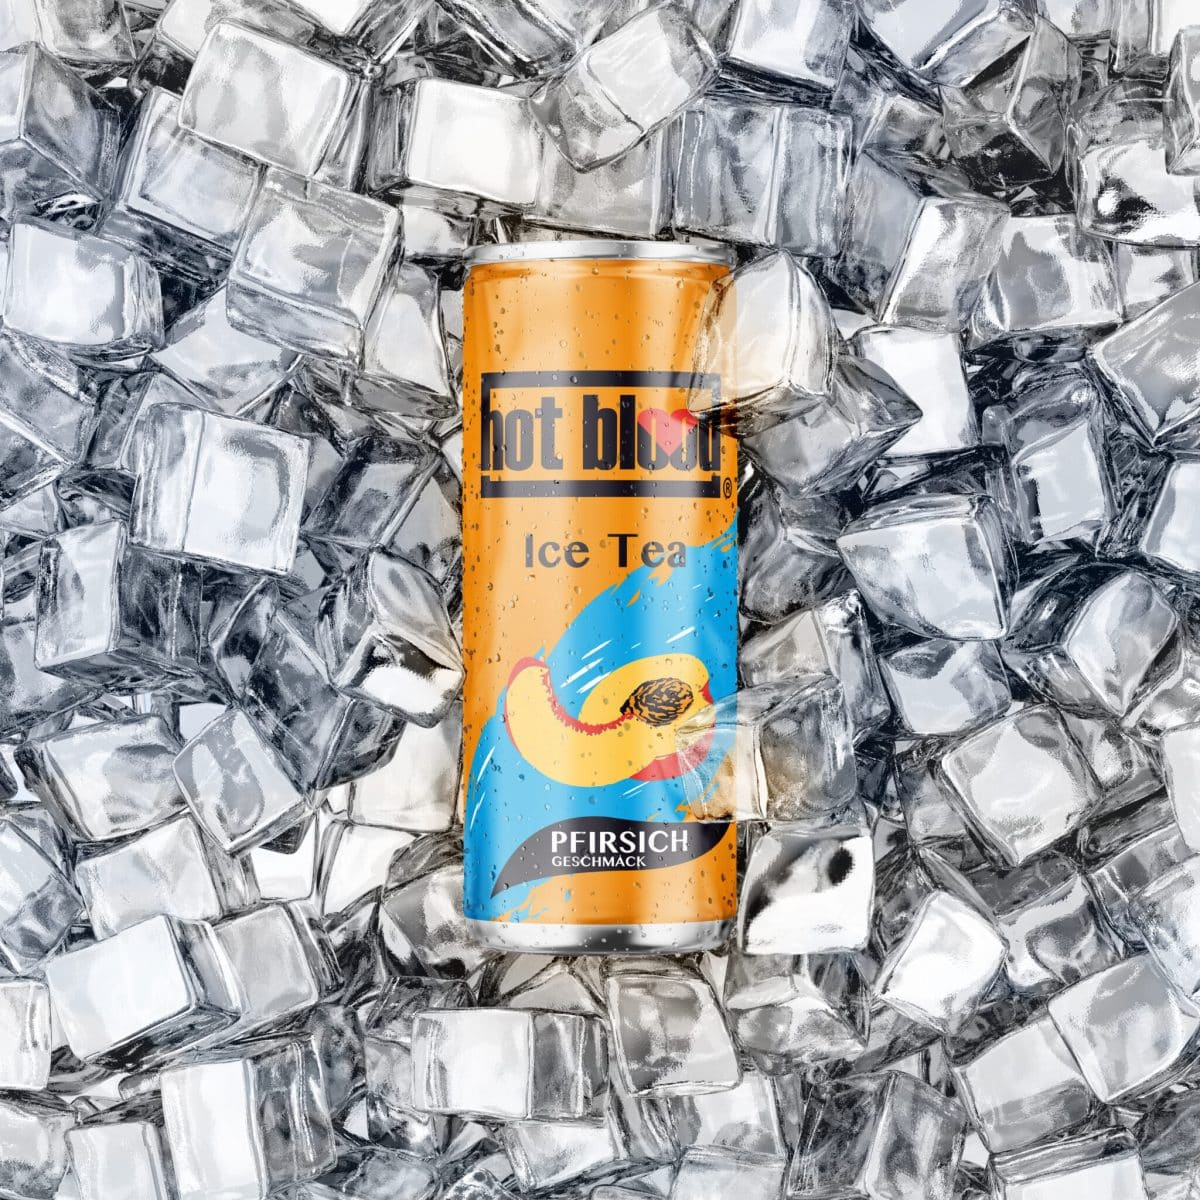 Hot Blood Ice Tea Pfirsich 330ml